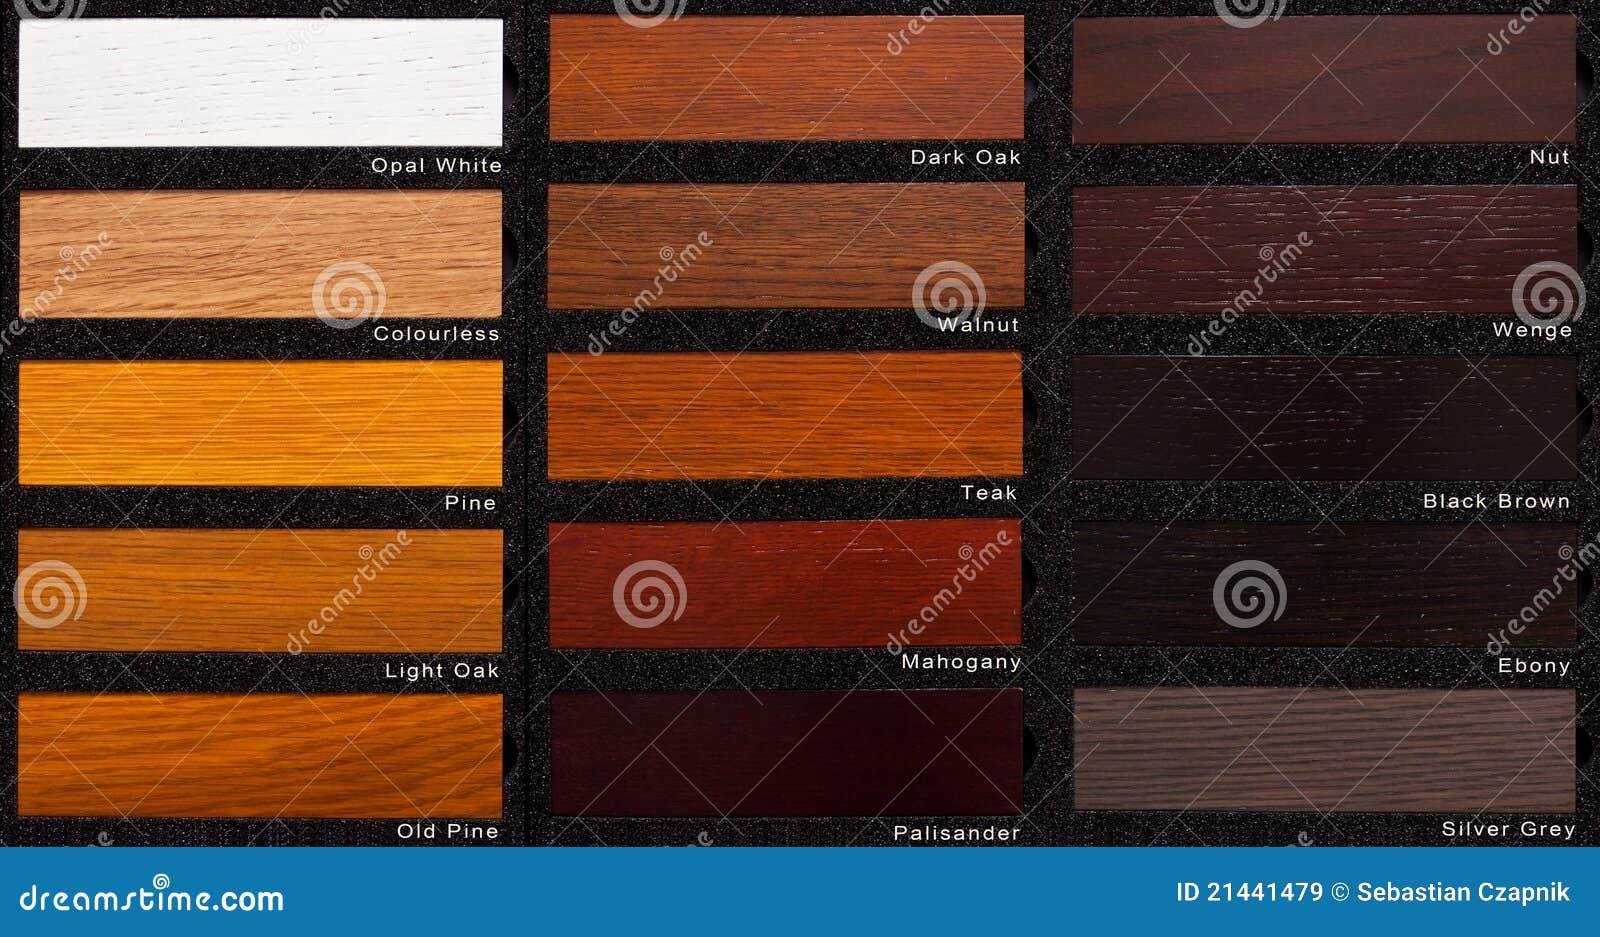 Royalty Free Stock Images Oak Wood Samples Image21441479 on Playground Floor Plan Design